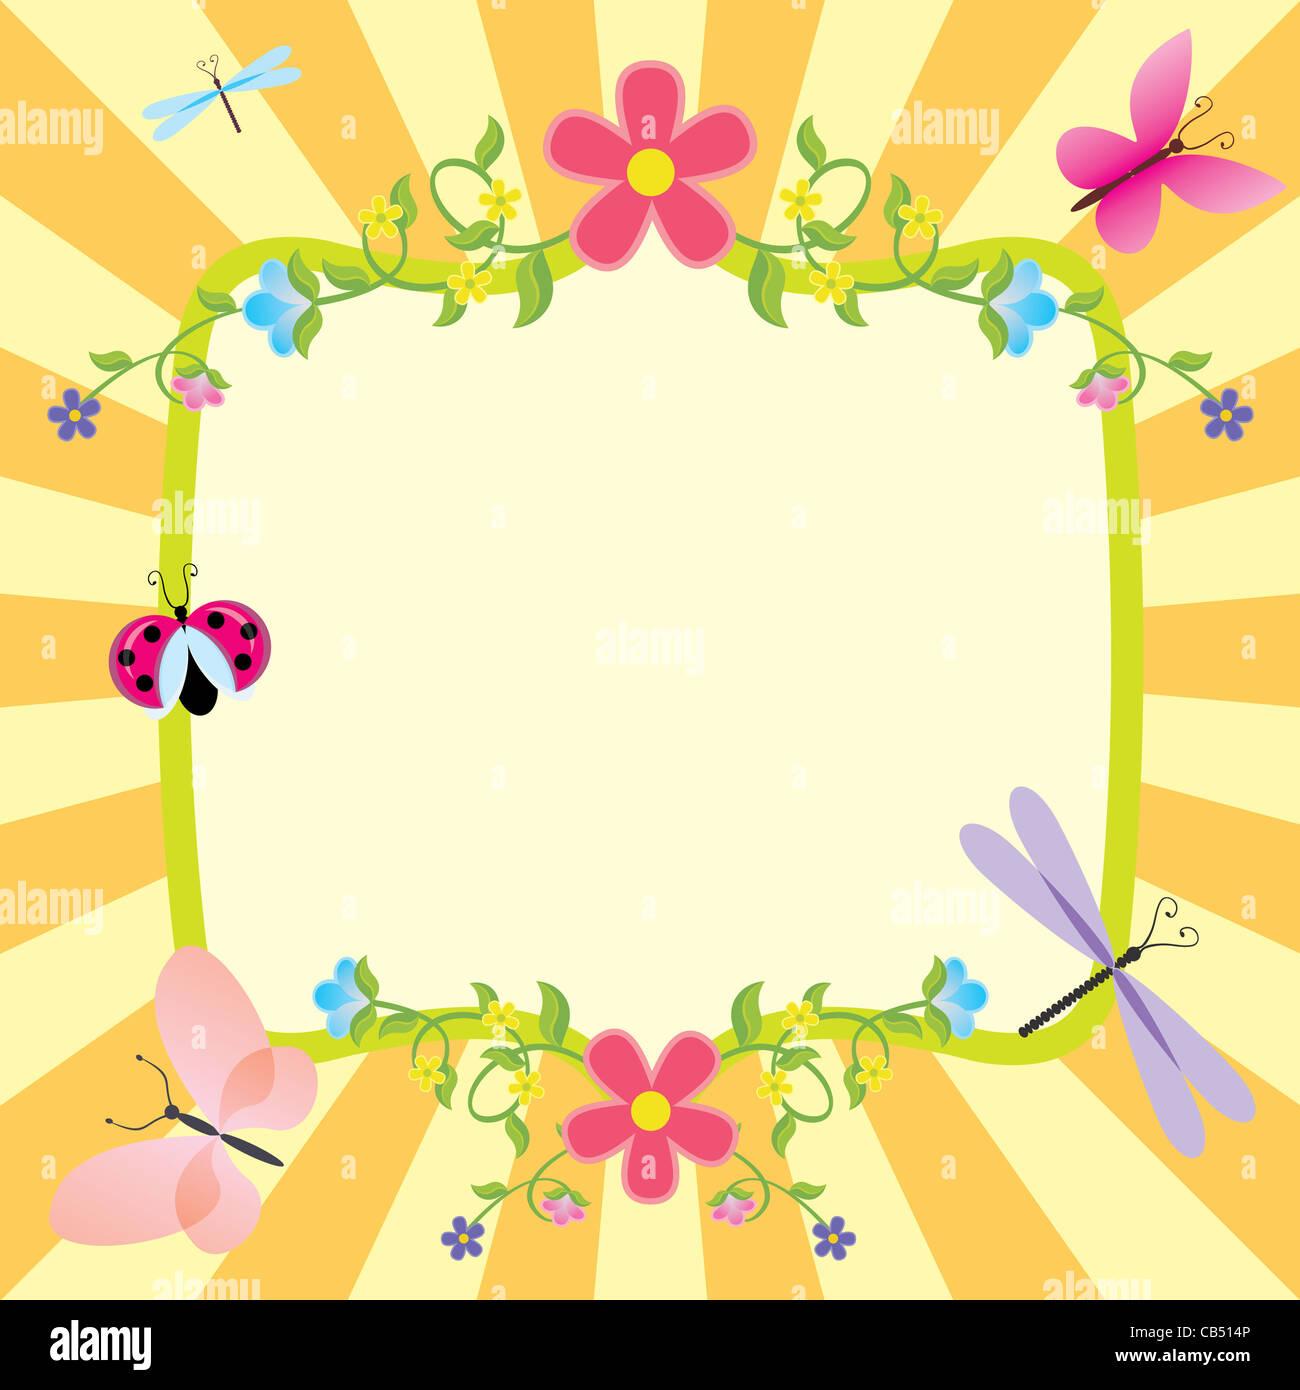 cartoon frame summer or spring easter - Stock Image